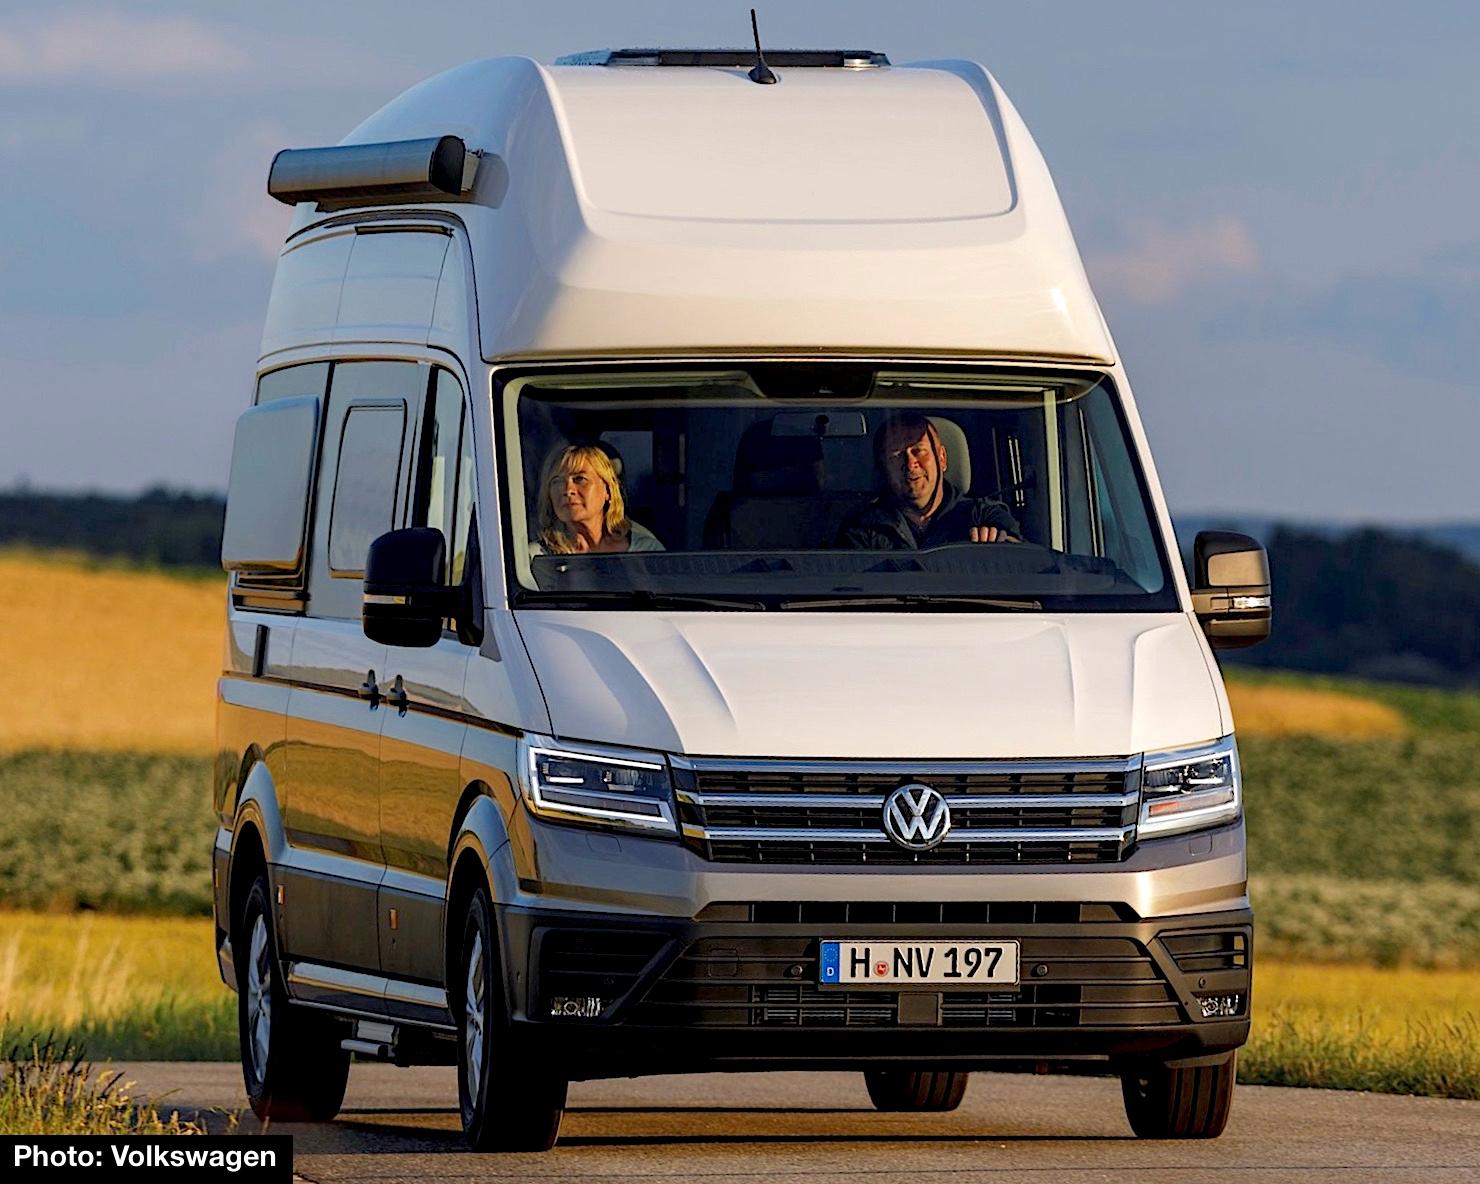 2019 volkswagen grand california preview new dream suite. Black Bedroom Furniture Sets. Home Design Ideas